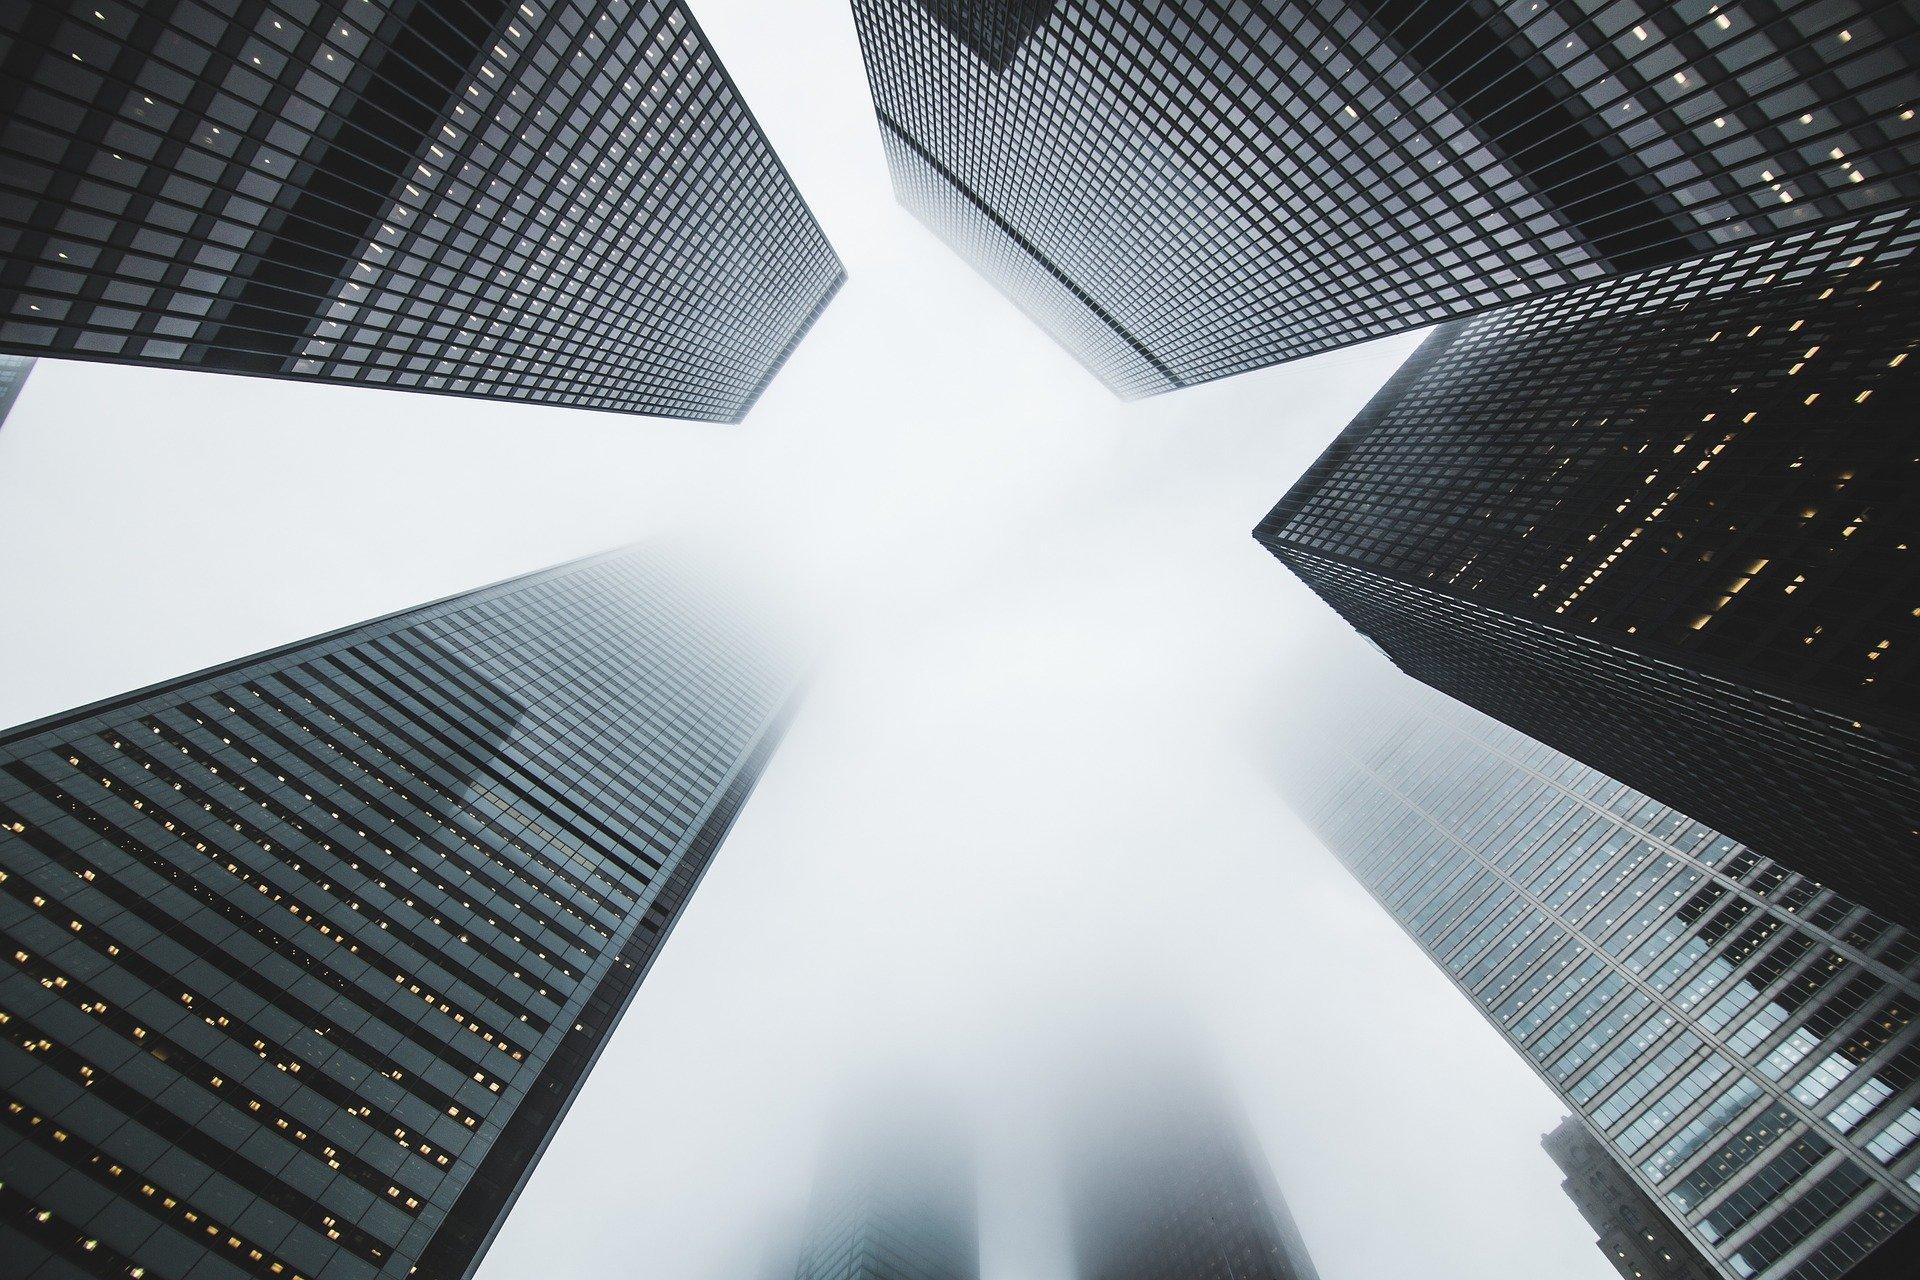 skyscrapers-Pixabay로부터 입수된 Free-Photos님의 이미지 입니다. .jpg